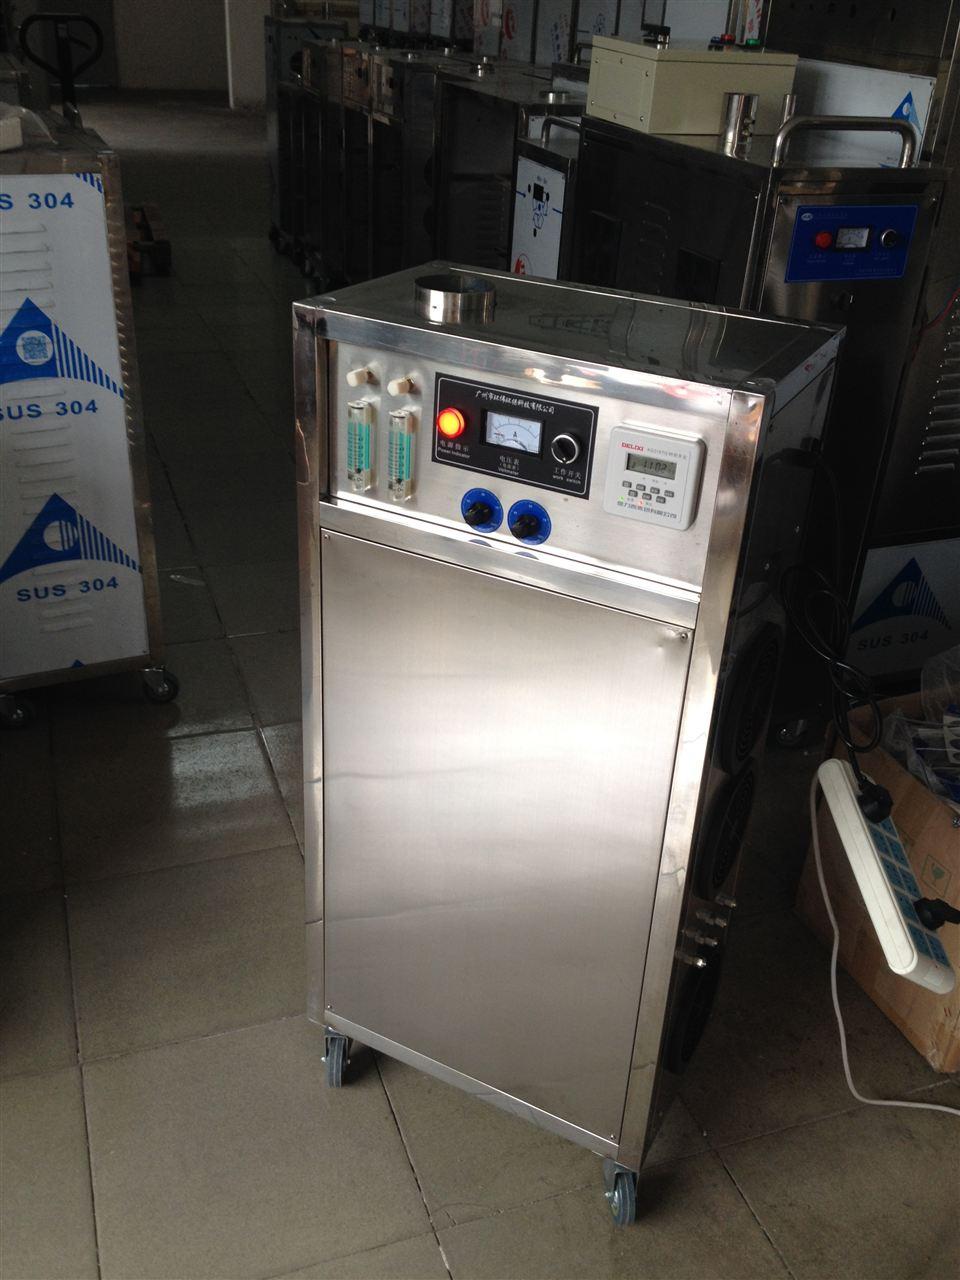 hw-o2-o3-50 油漆生产用水杀菌臭氧发生器,冷却水杀菌除臭臭氧机